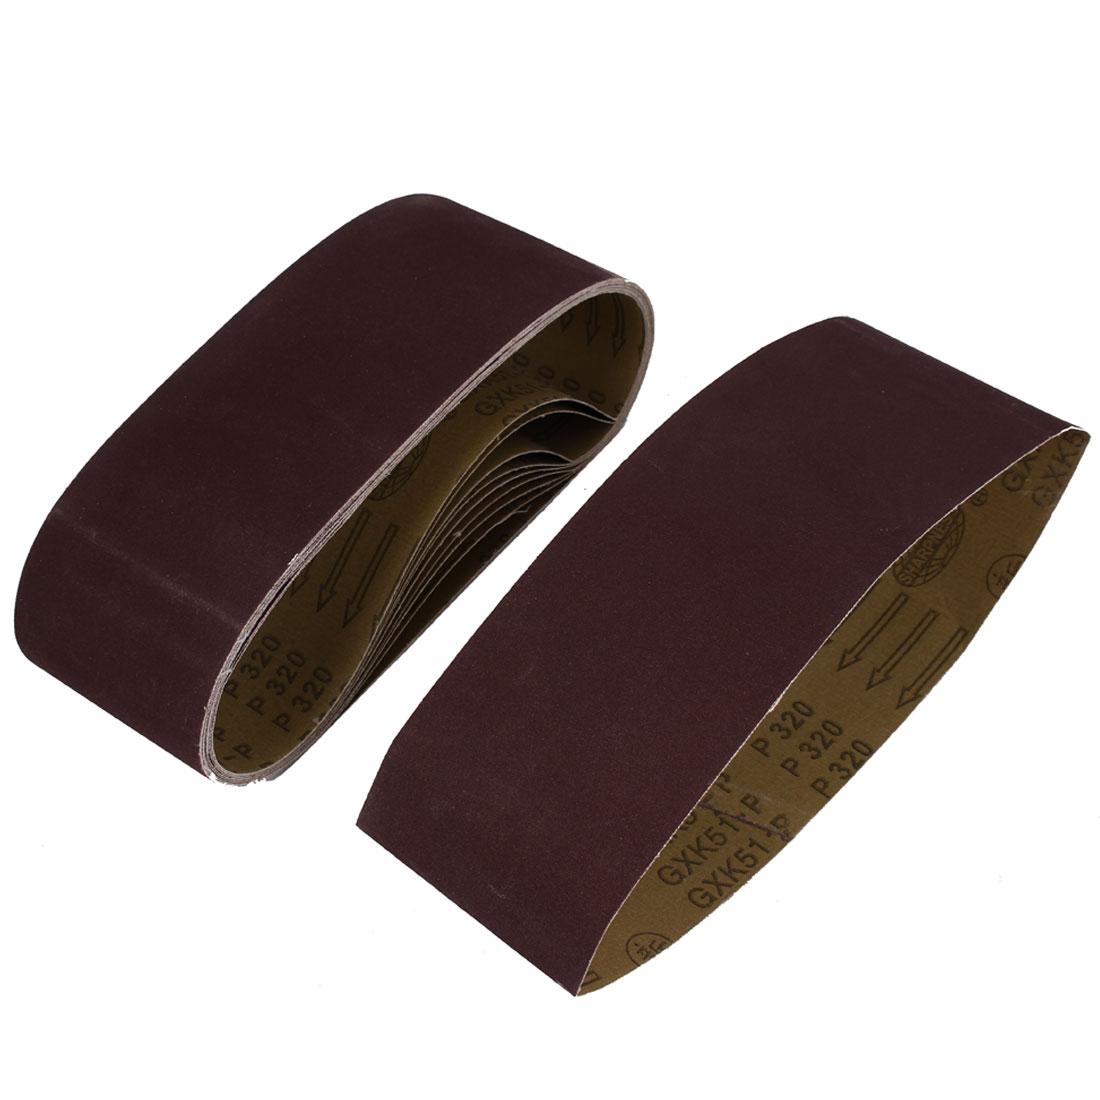 Polishing Machine Woodworking 610x100mm 320 Grit Sanding Abrasive Belt 10pcs